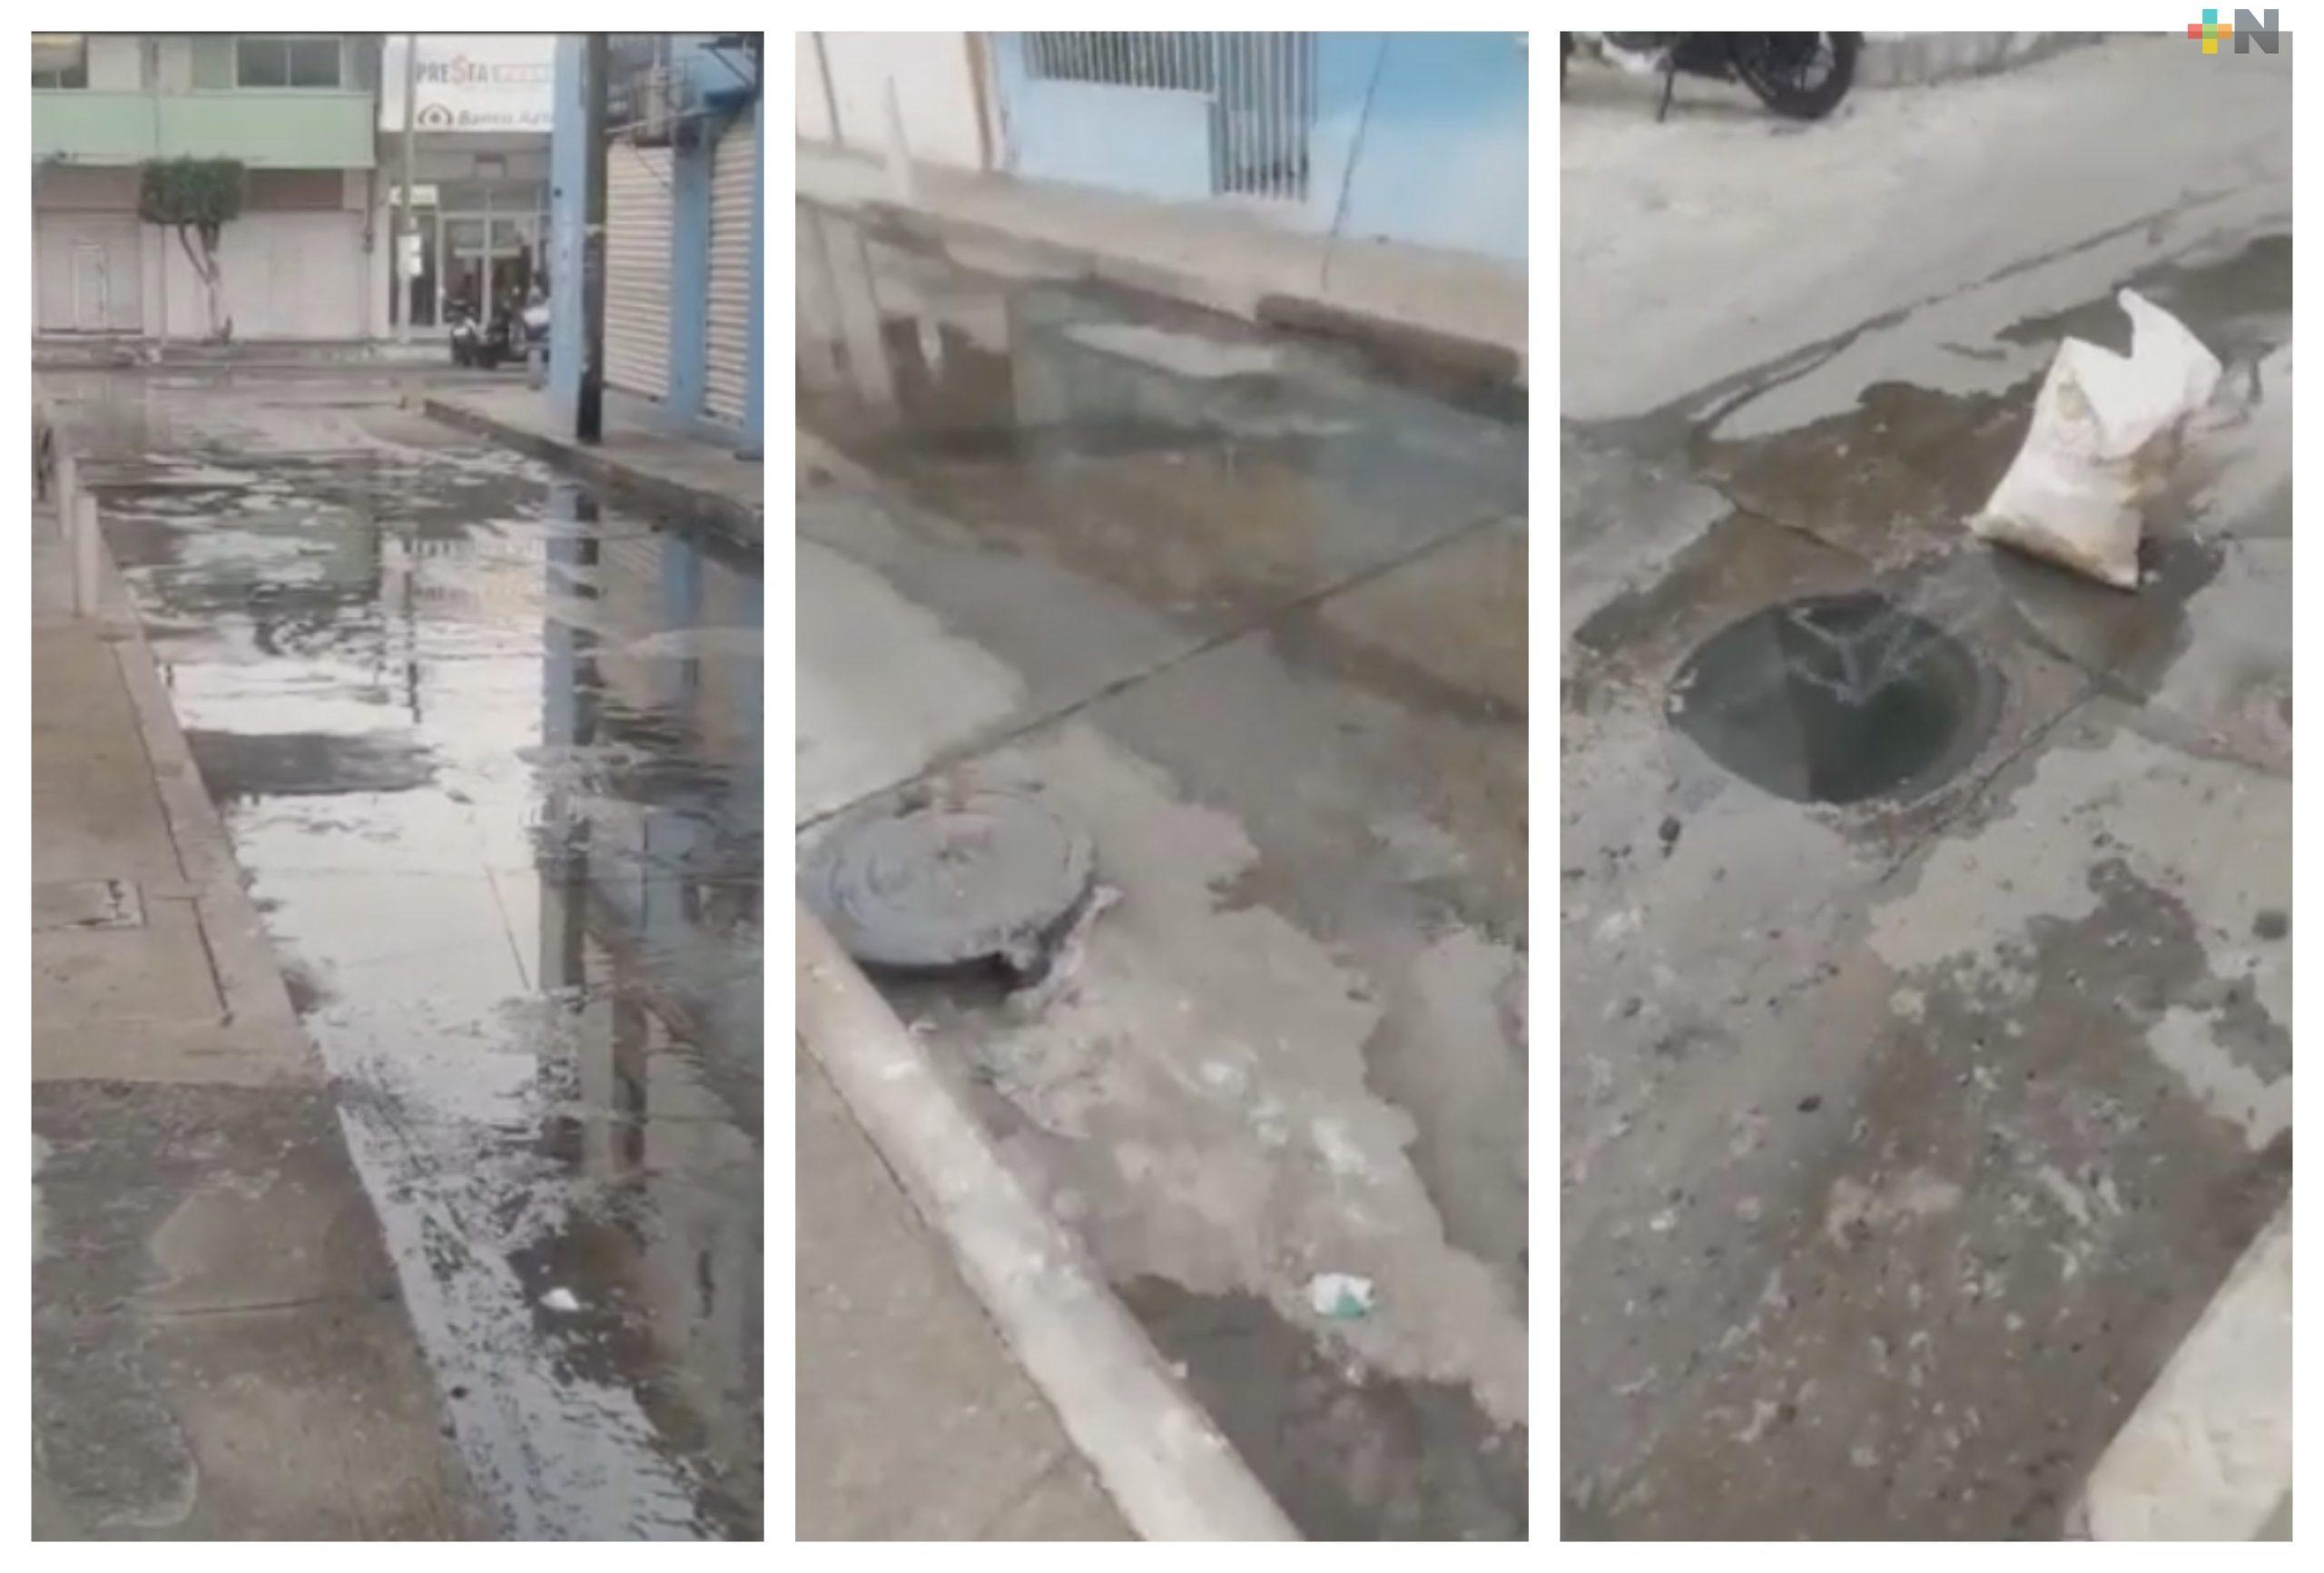 Reportan fuga de aguas negras en centro de Alvarado